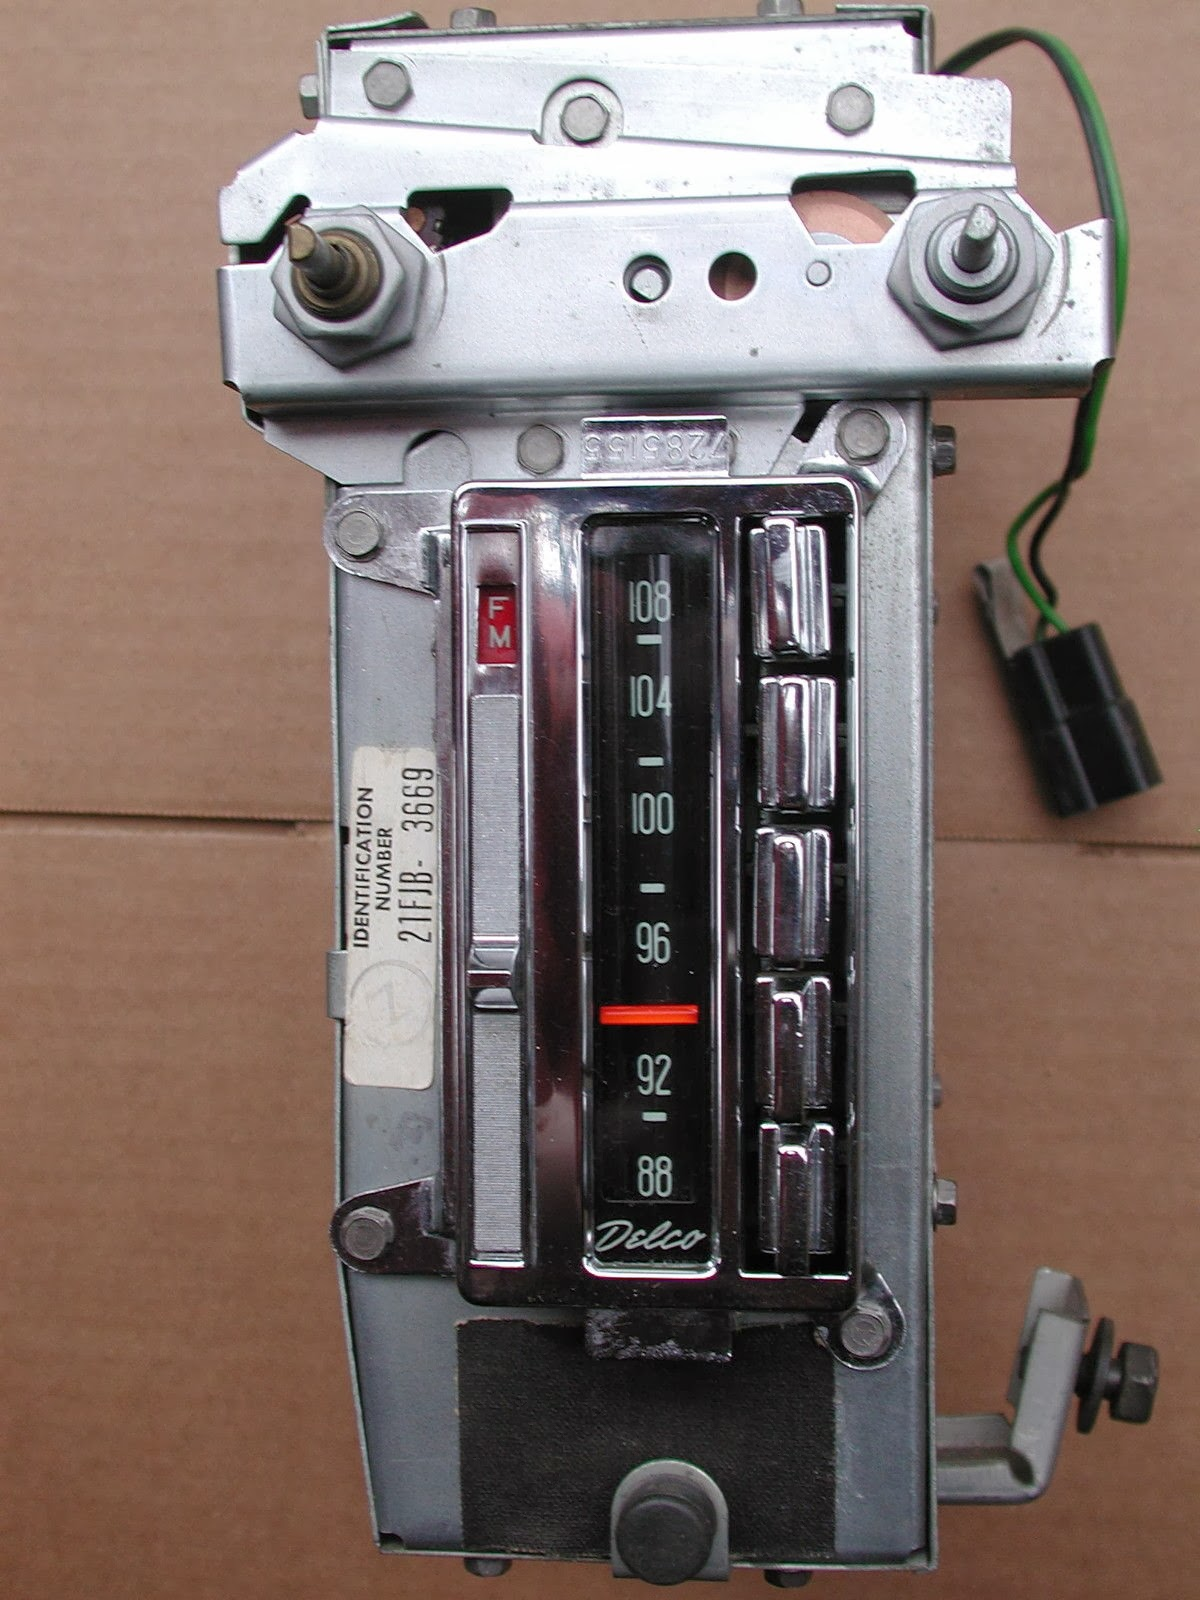 1966 Corvette Radio Wiring Diagram Danlers Pir 1984 Yamaha Virago 700 Schematic Xj750